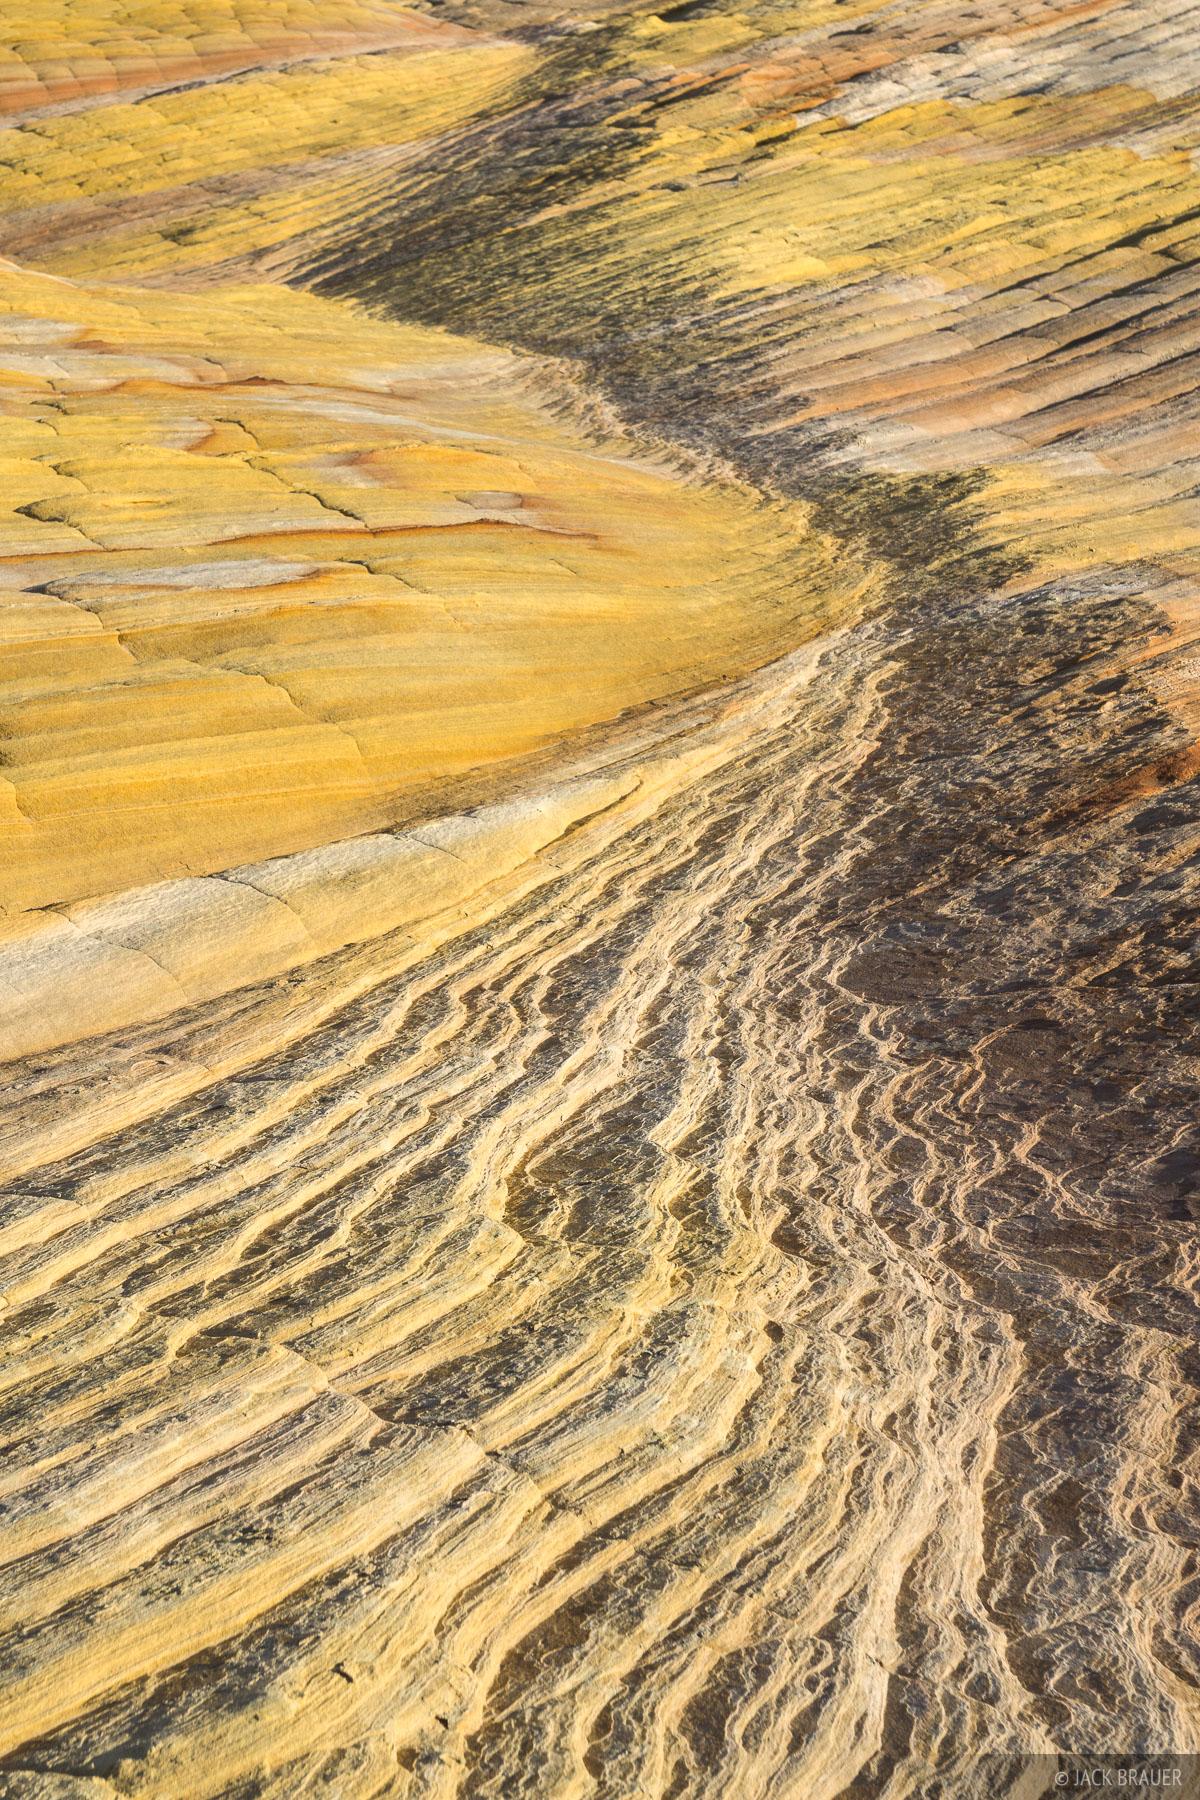 Utah,Yellow Rock, Cockscomb, photo